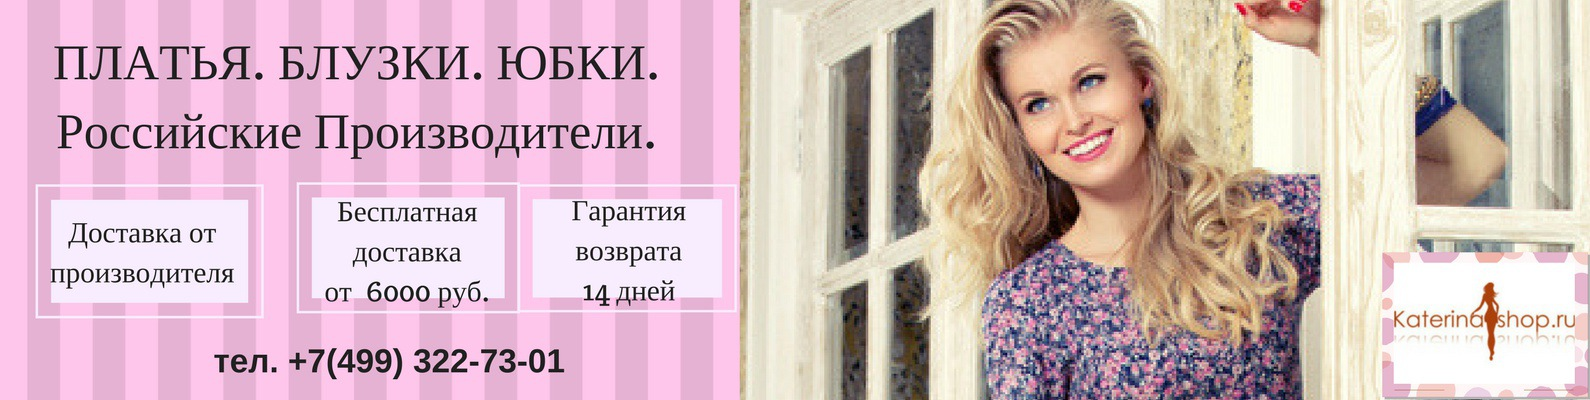 f1c6f92129d Платья. Интернет-магазин Katerina-shop.ru